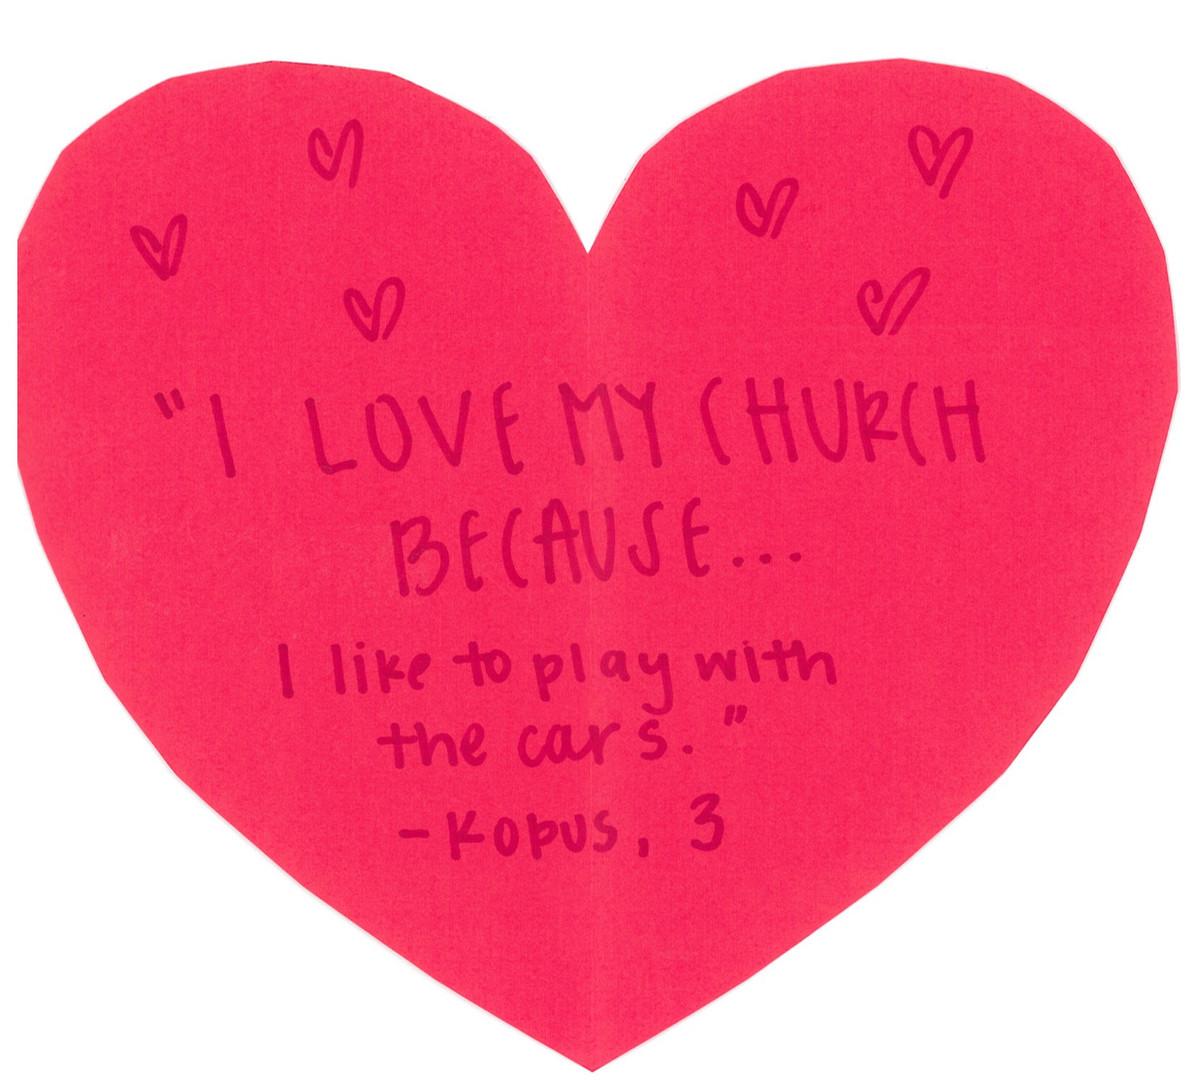 Kids#ilovefumcbv3.jpg